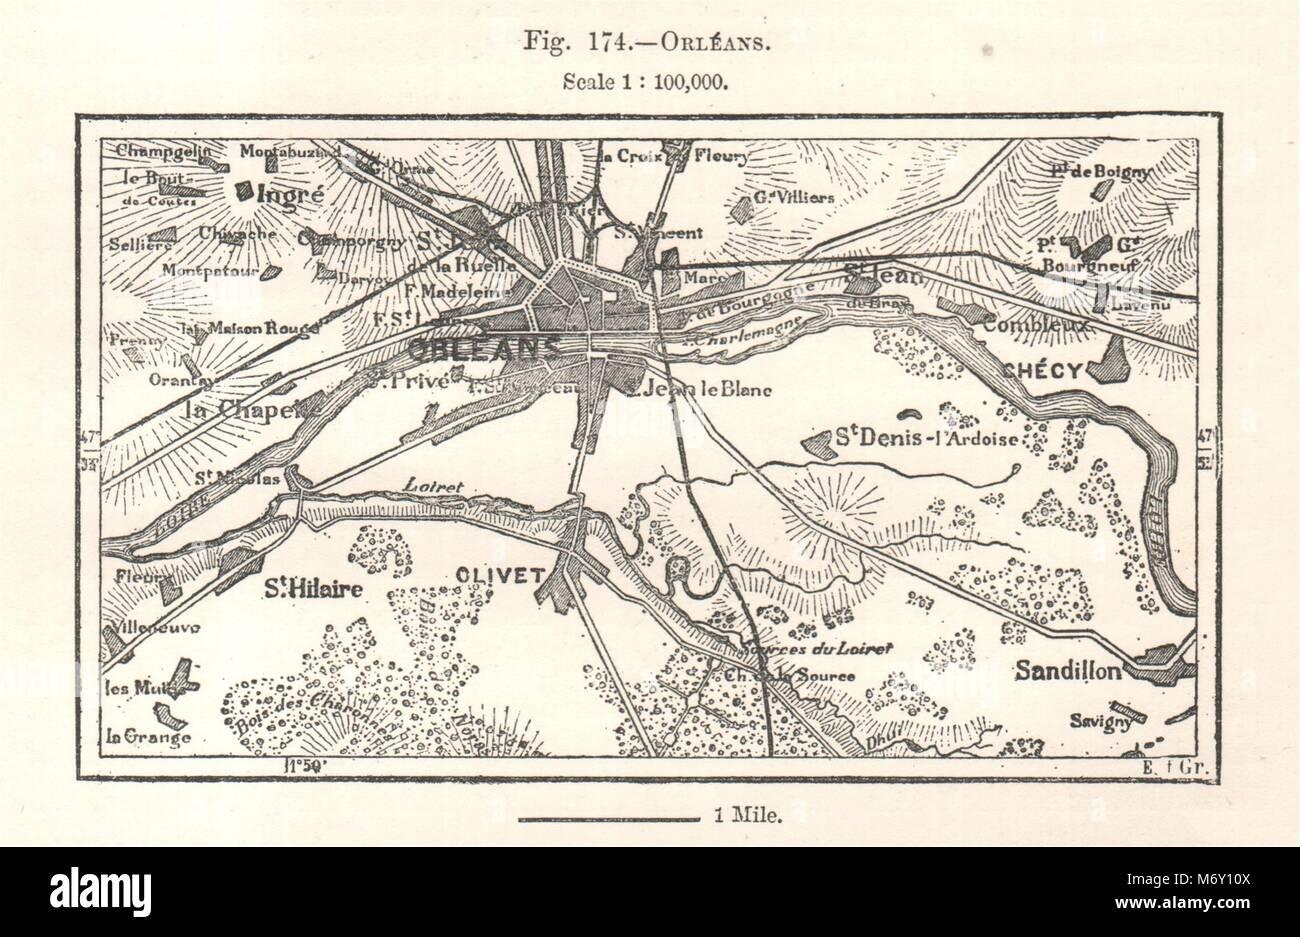 Orléans Orleans & Environs Loiret Sketch Map 1885 Old Antique Plan Chart